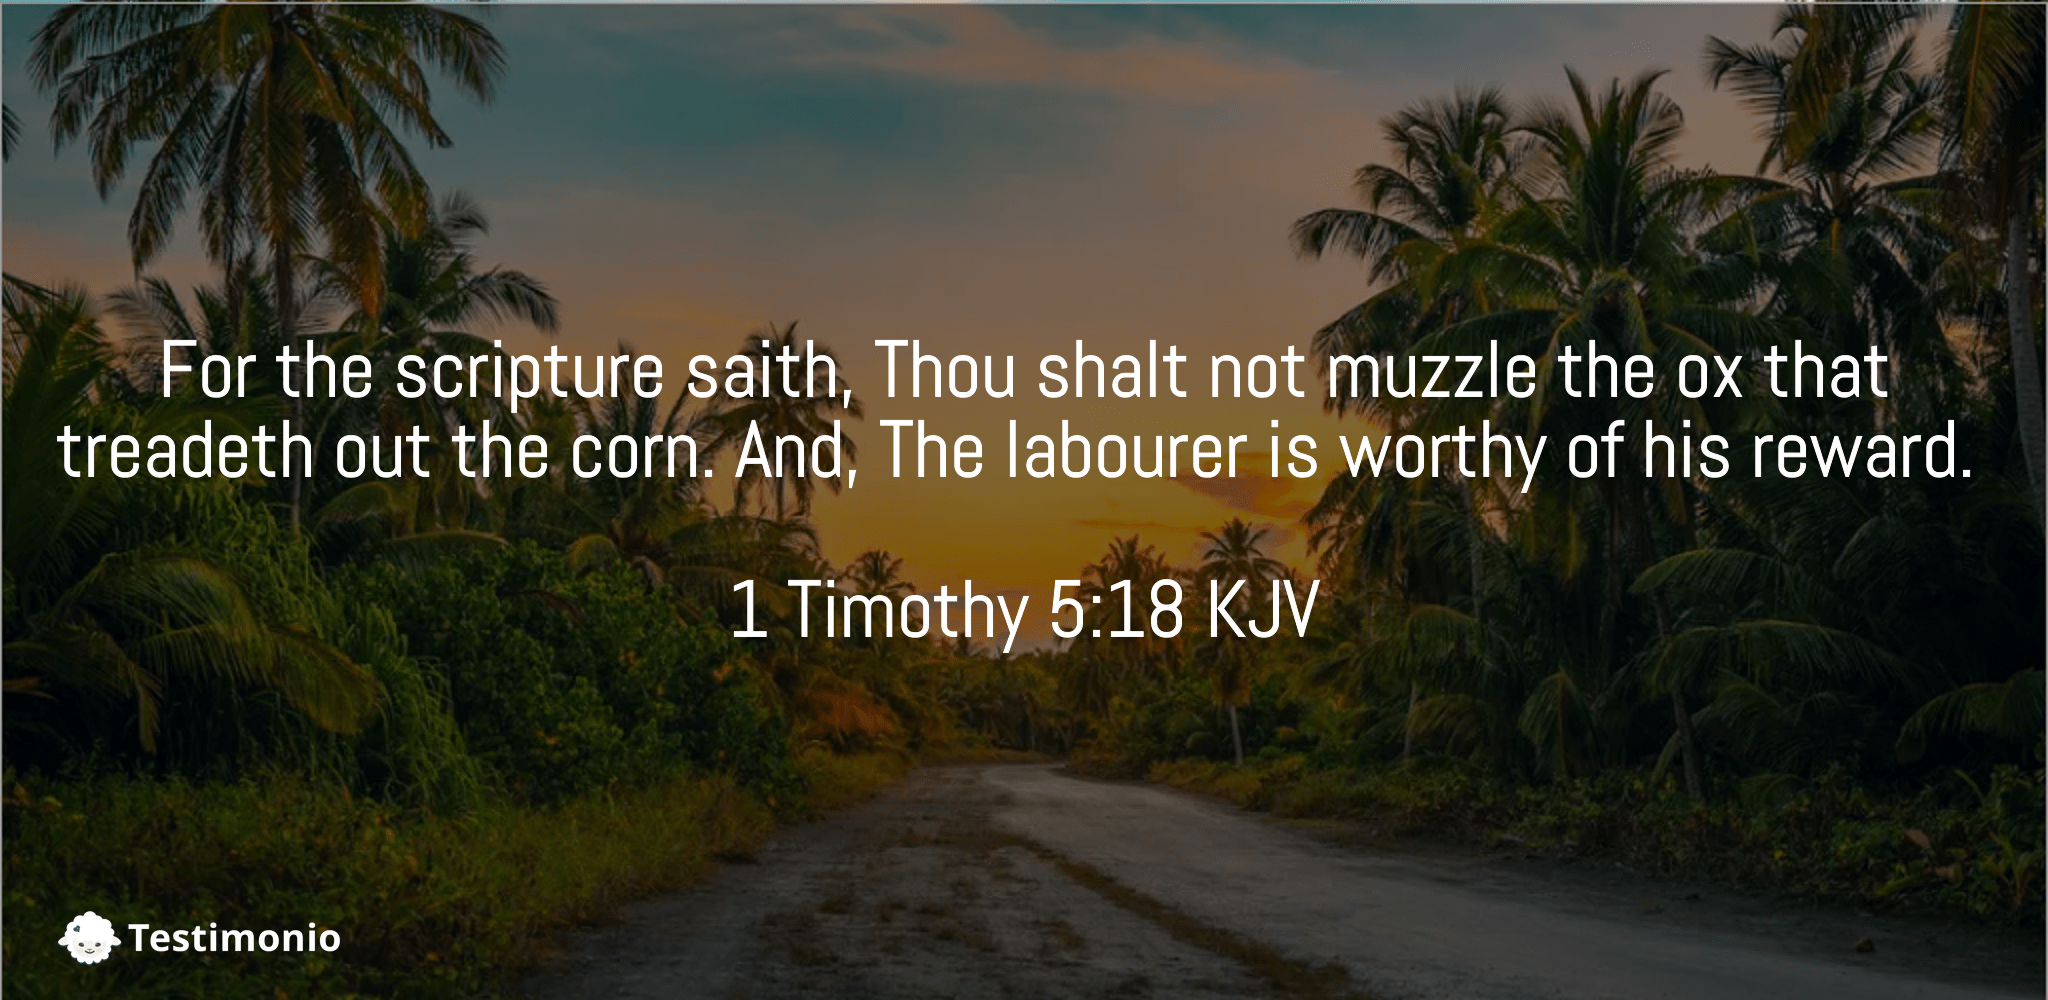 1 Timothy 5:18